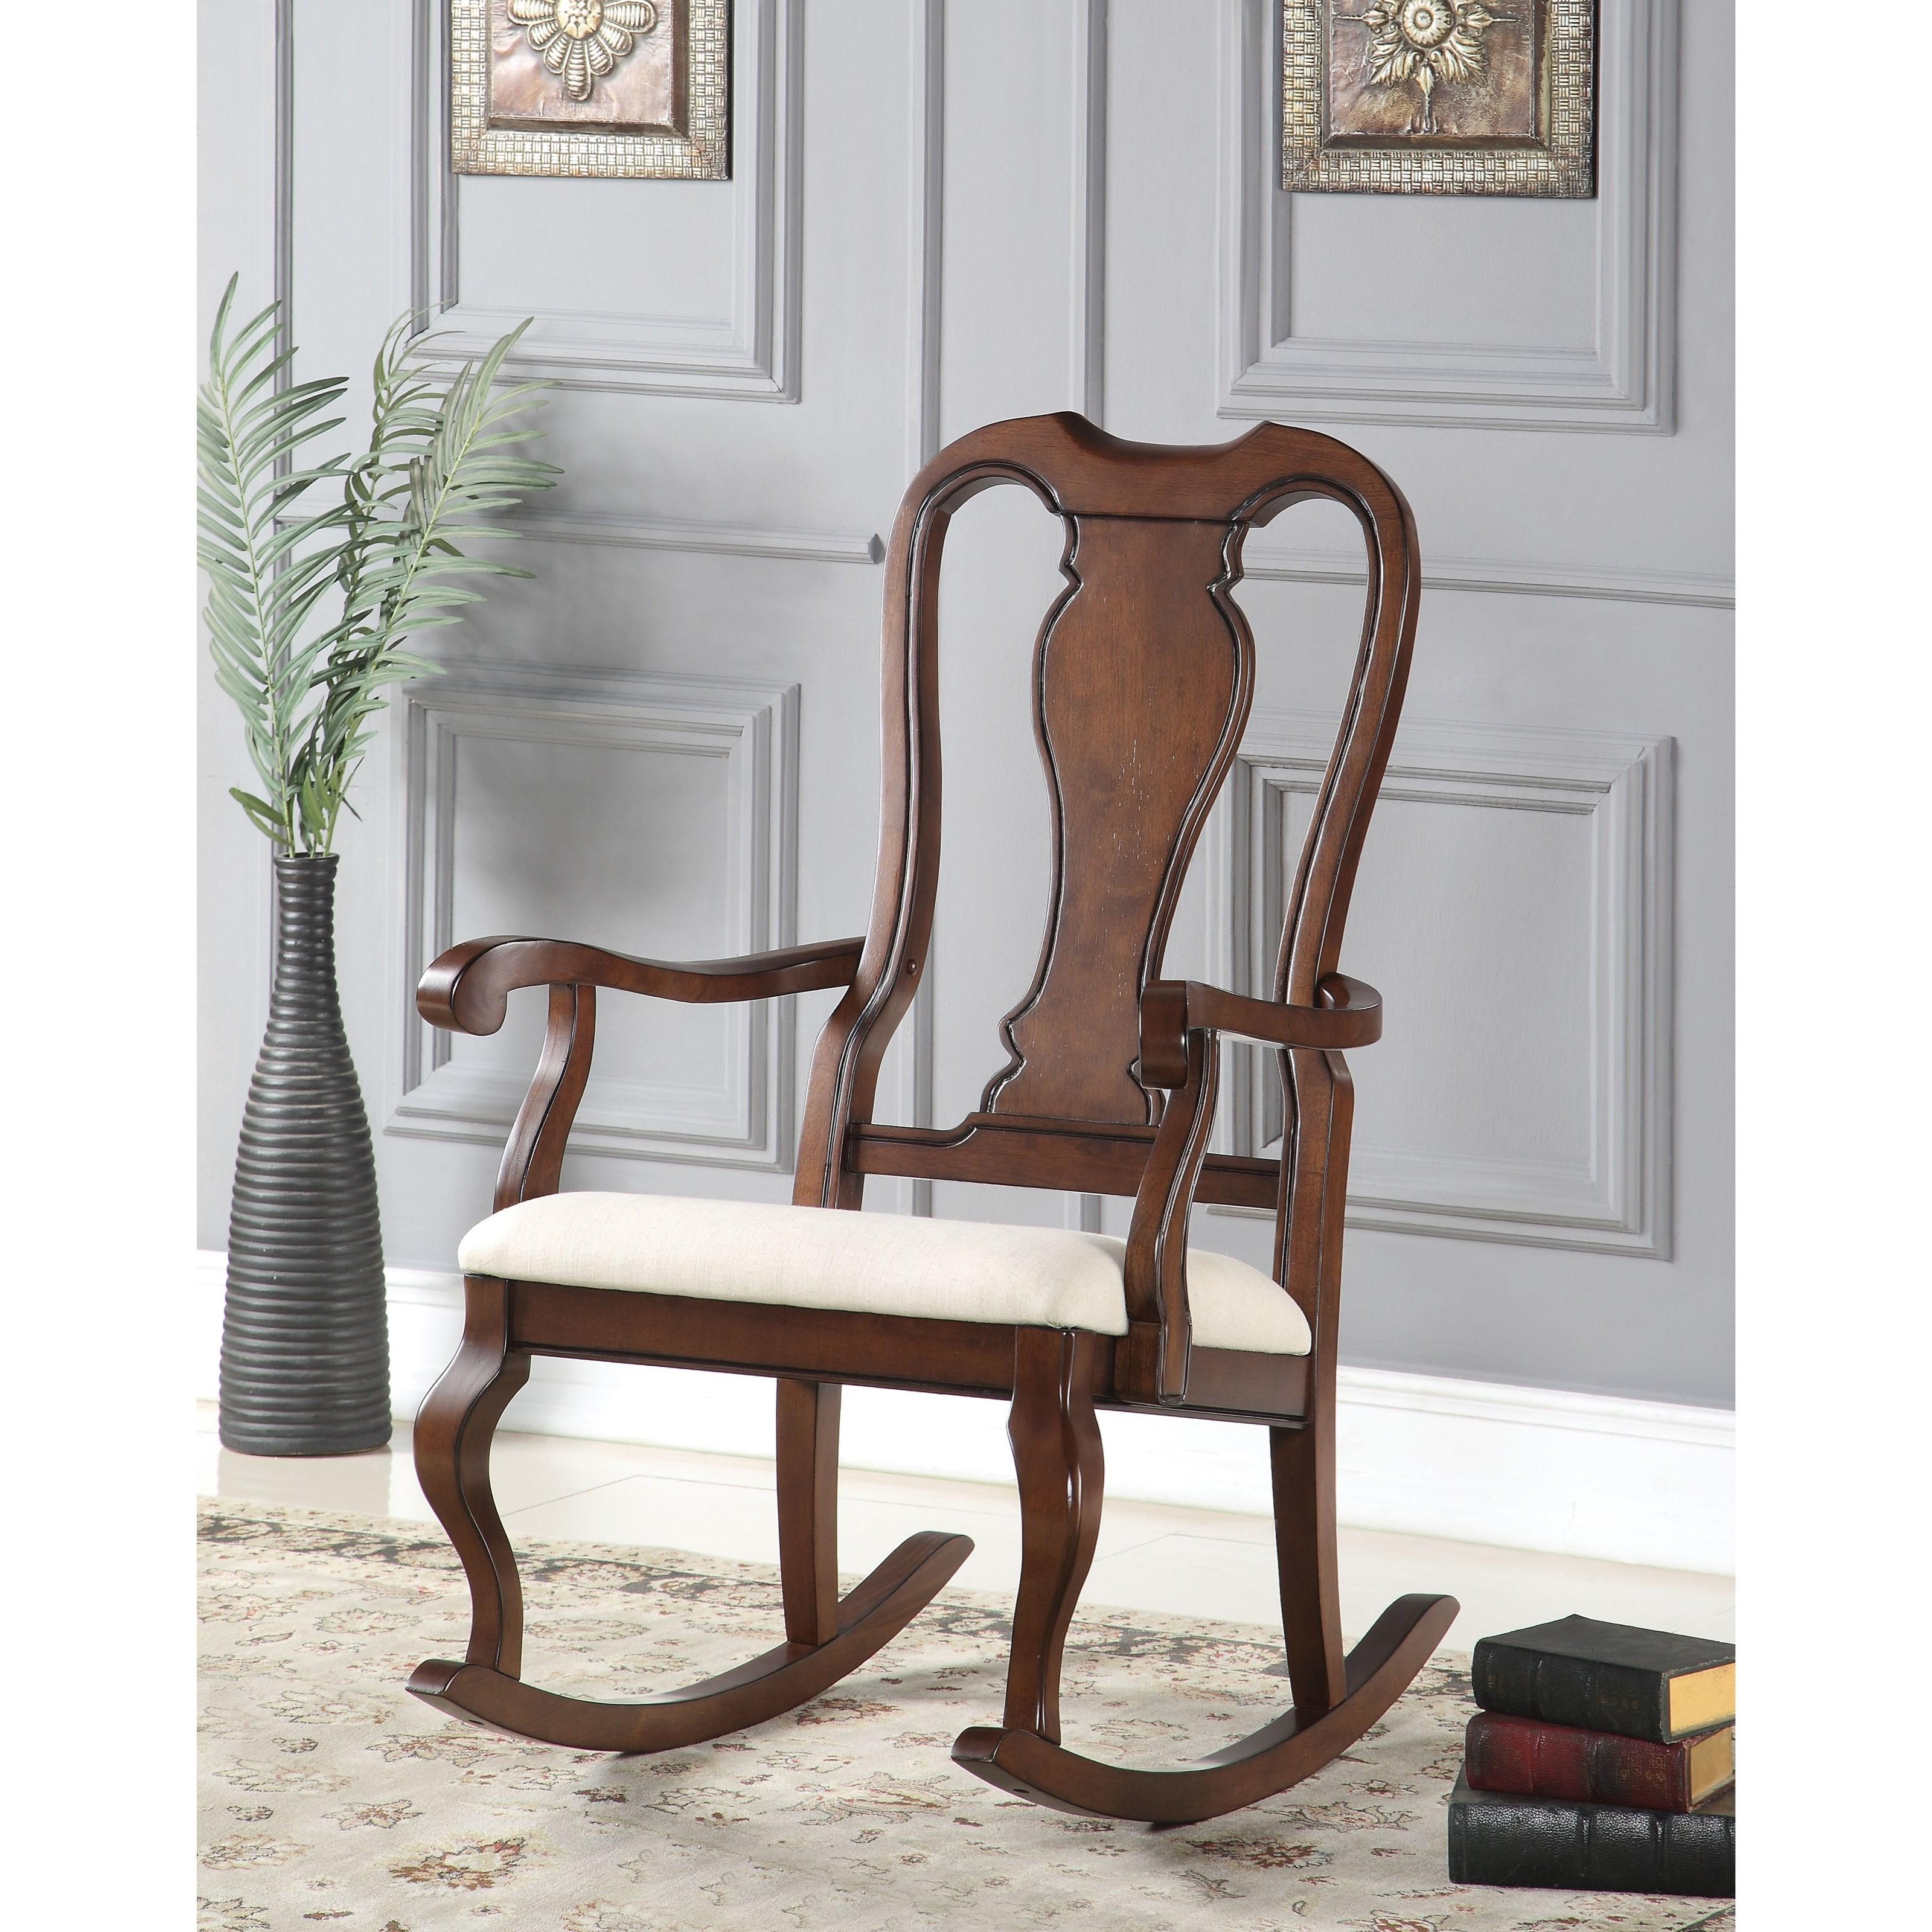 Sheim Rocking Chair by Acme Furniture at Carolina Direct